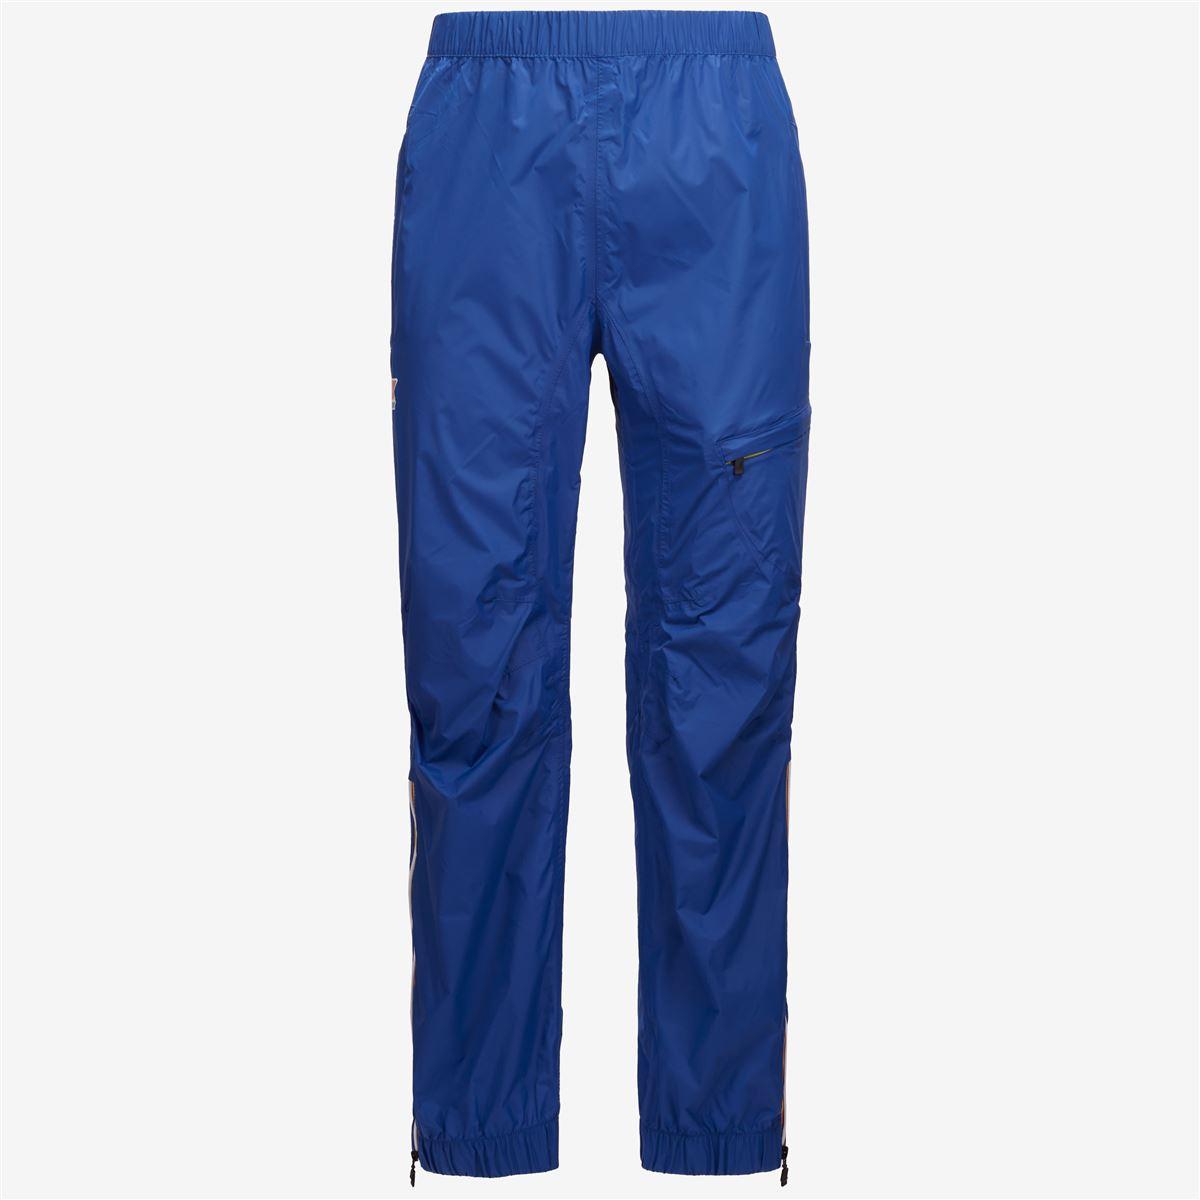 K-Way Pants LE VRAI 3.0 EDGARD Man Woman Sport Trousers